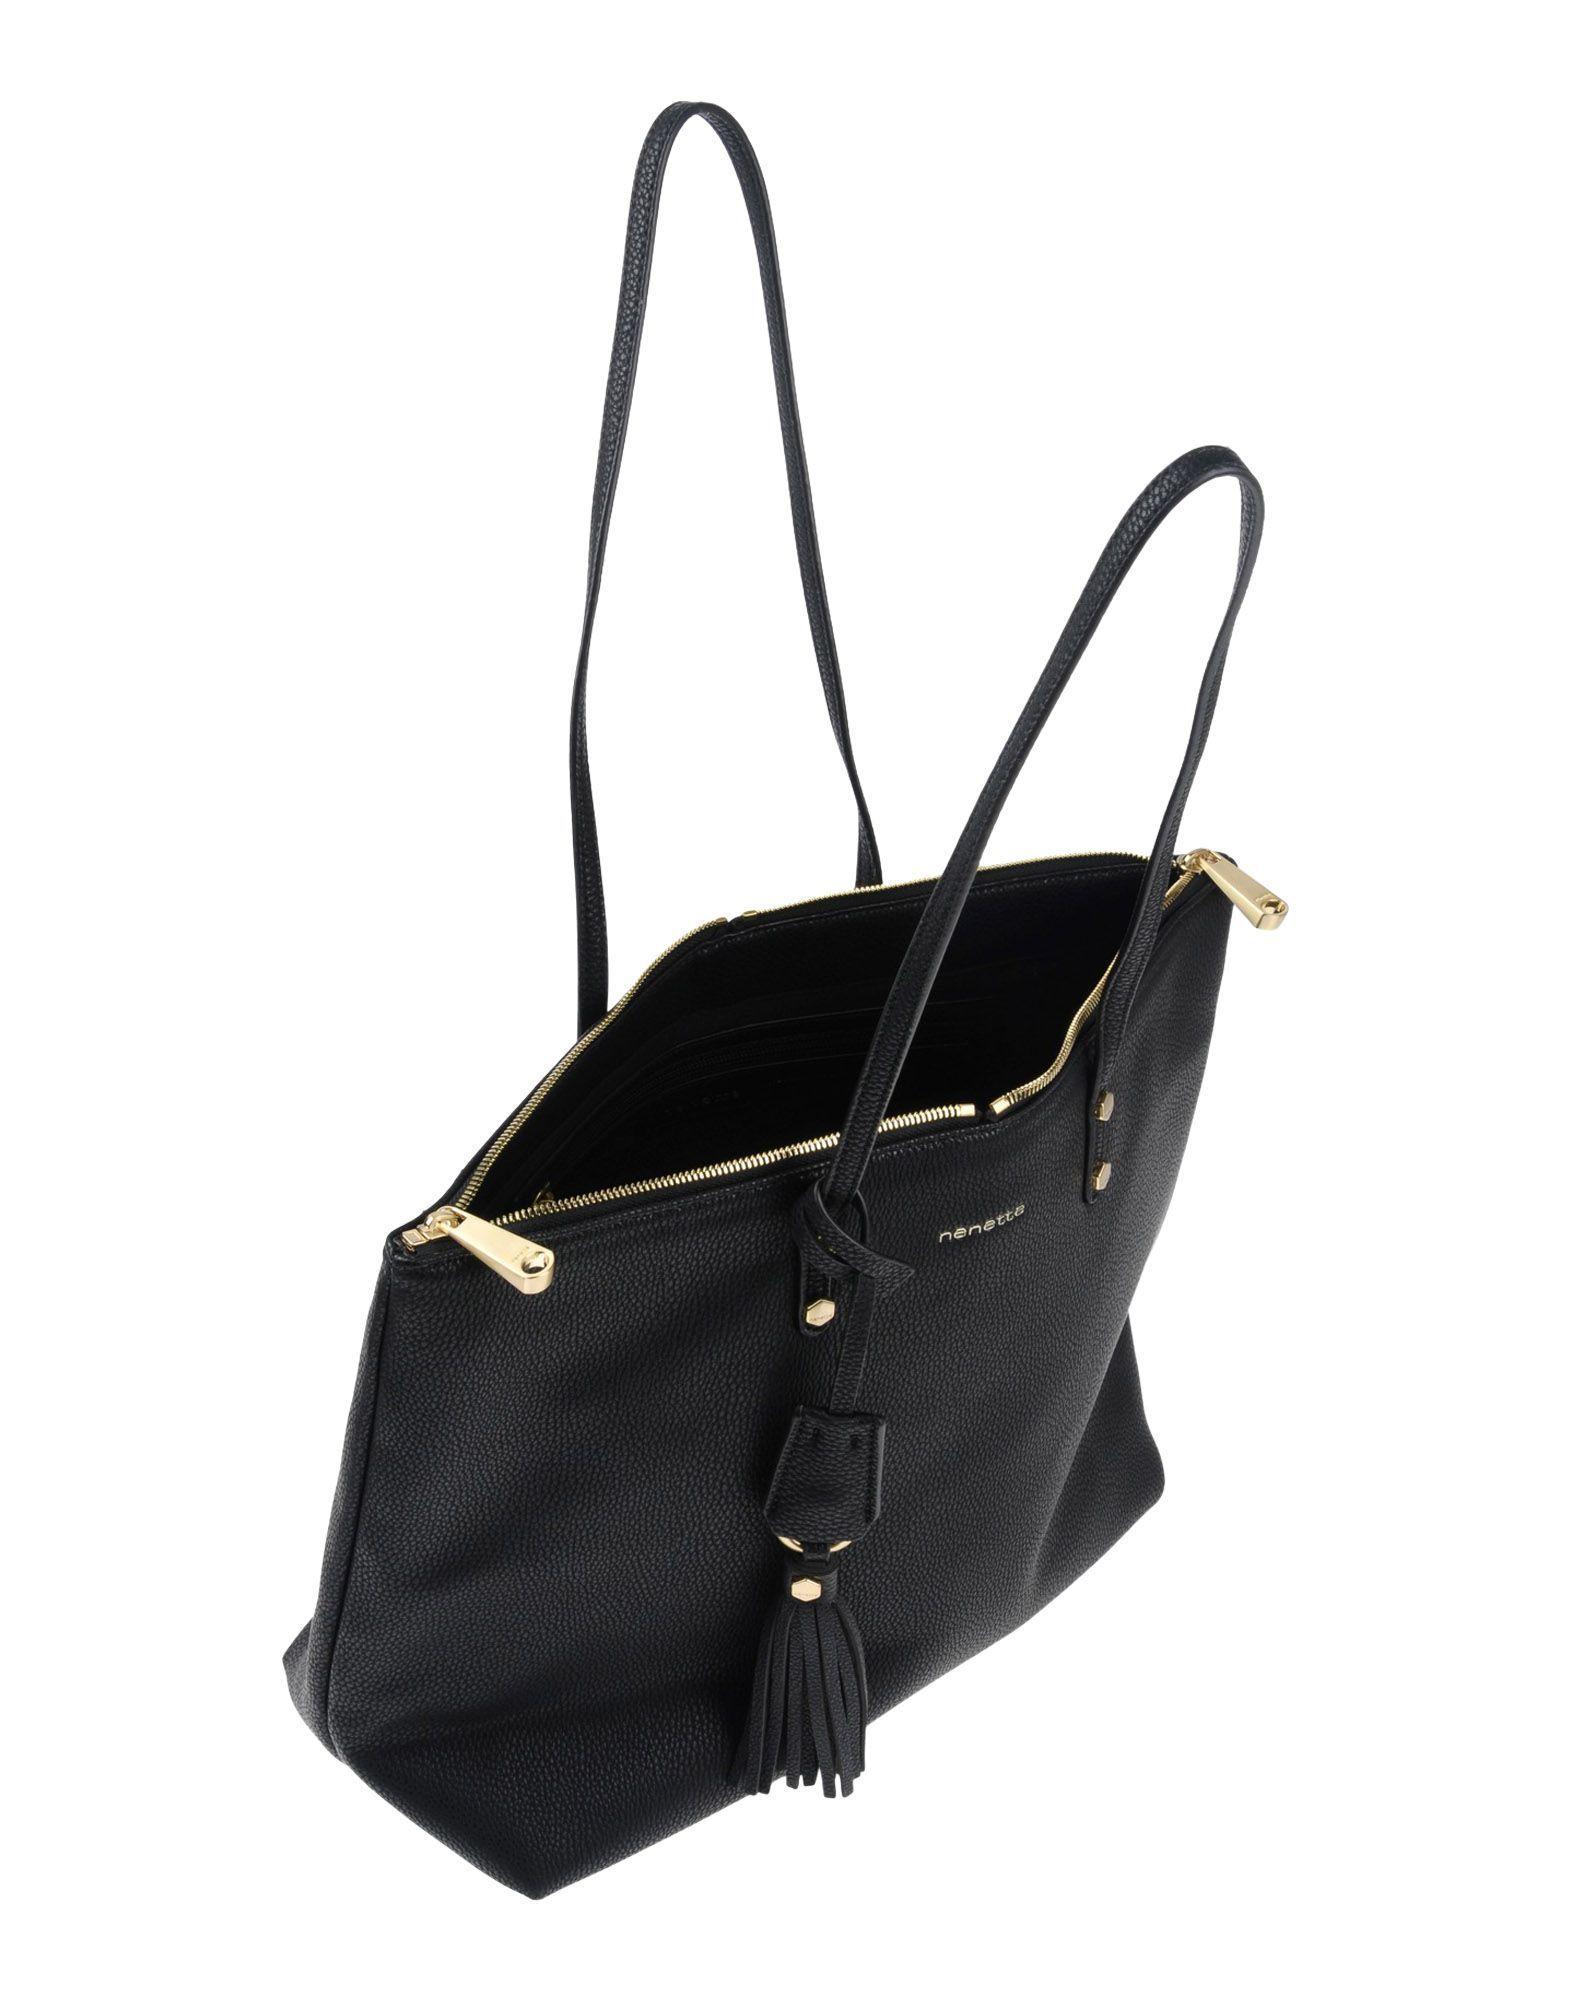 Nenette Black Faux Leather Shopper Bag